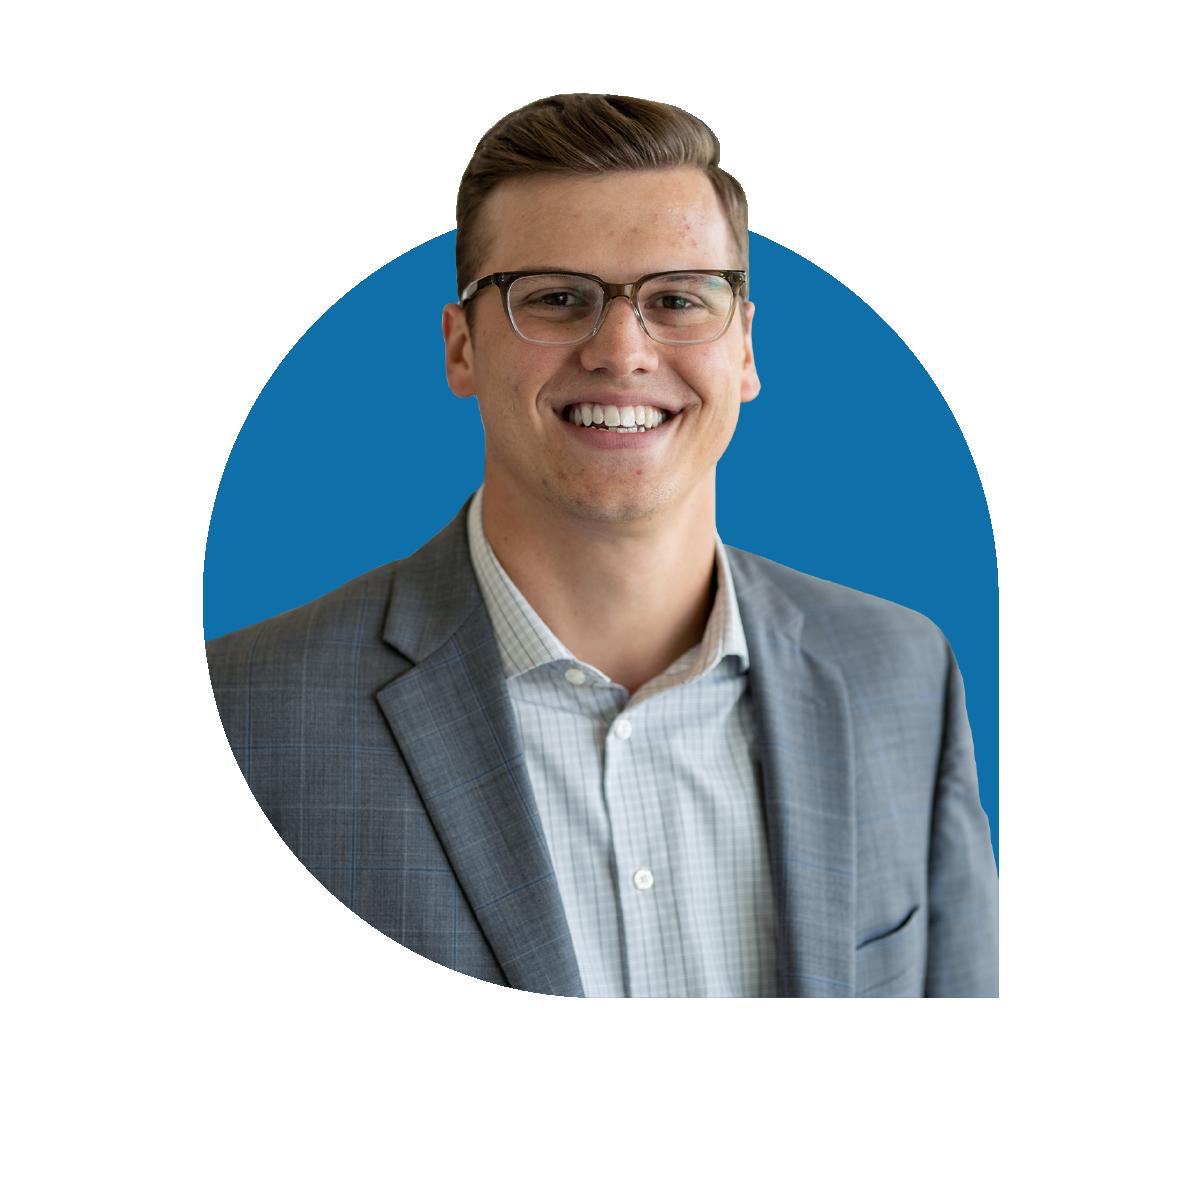 Headshot of Kyle Fawcett director of marketing at Bankable